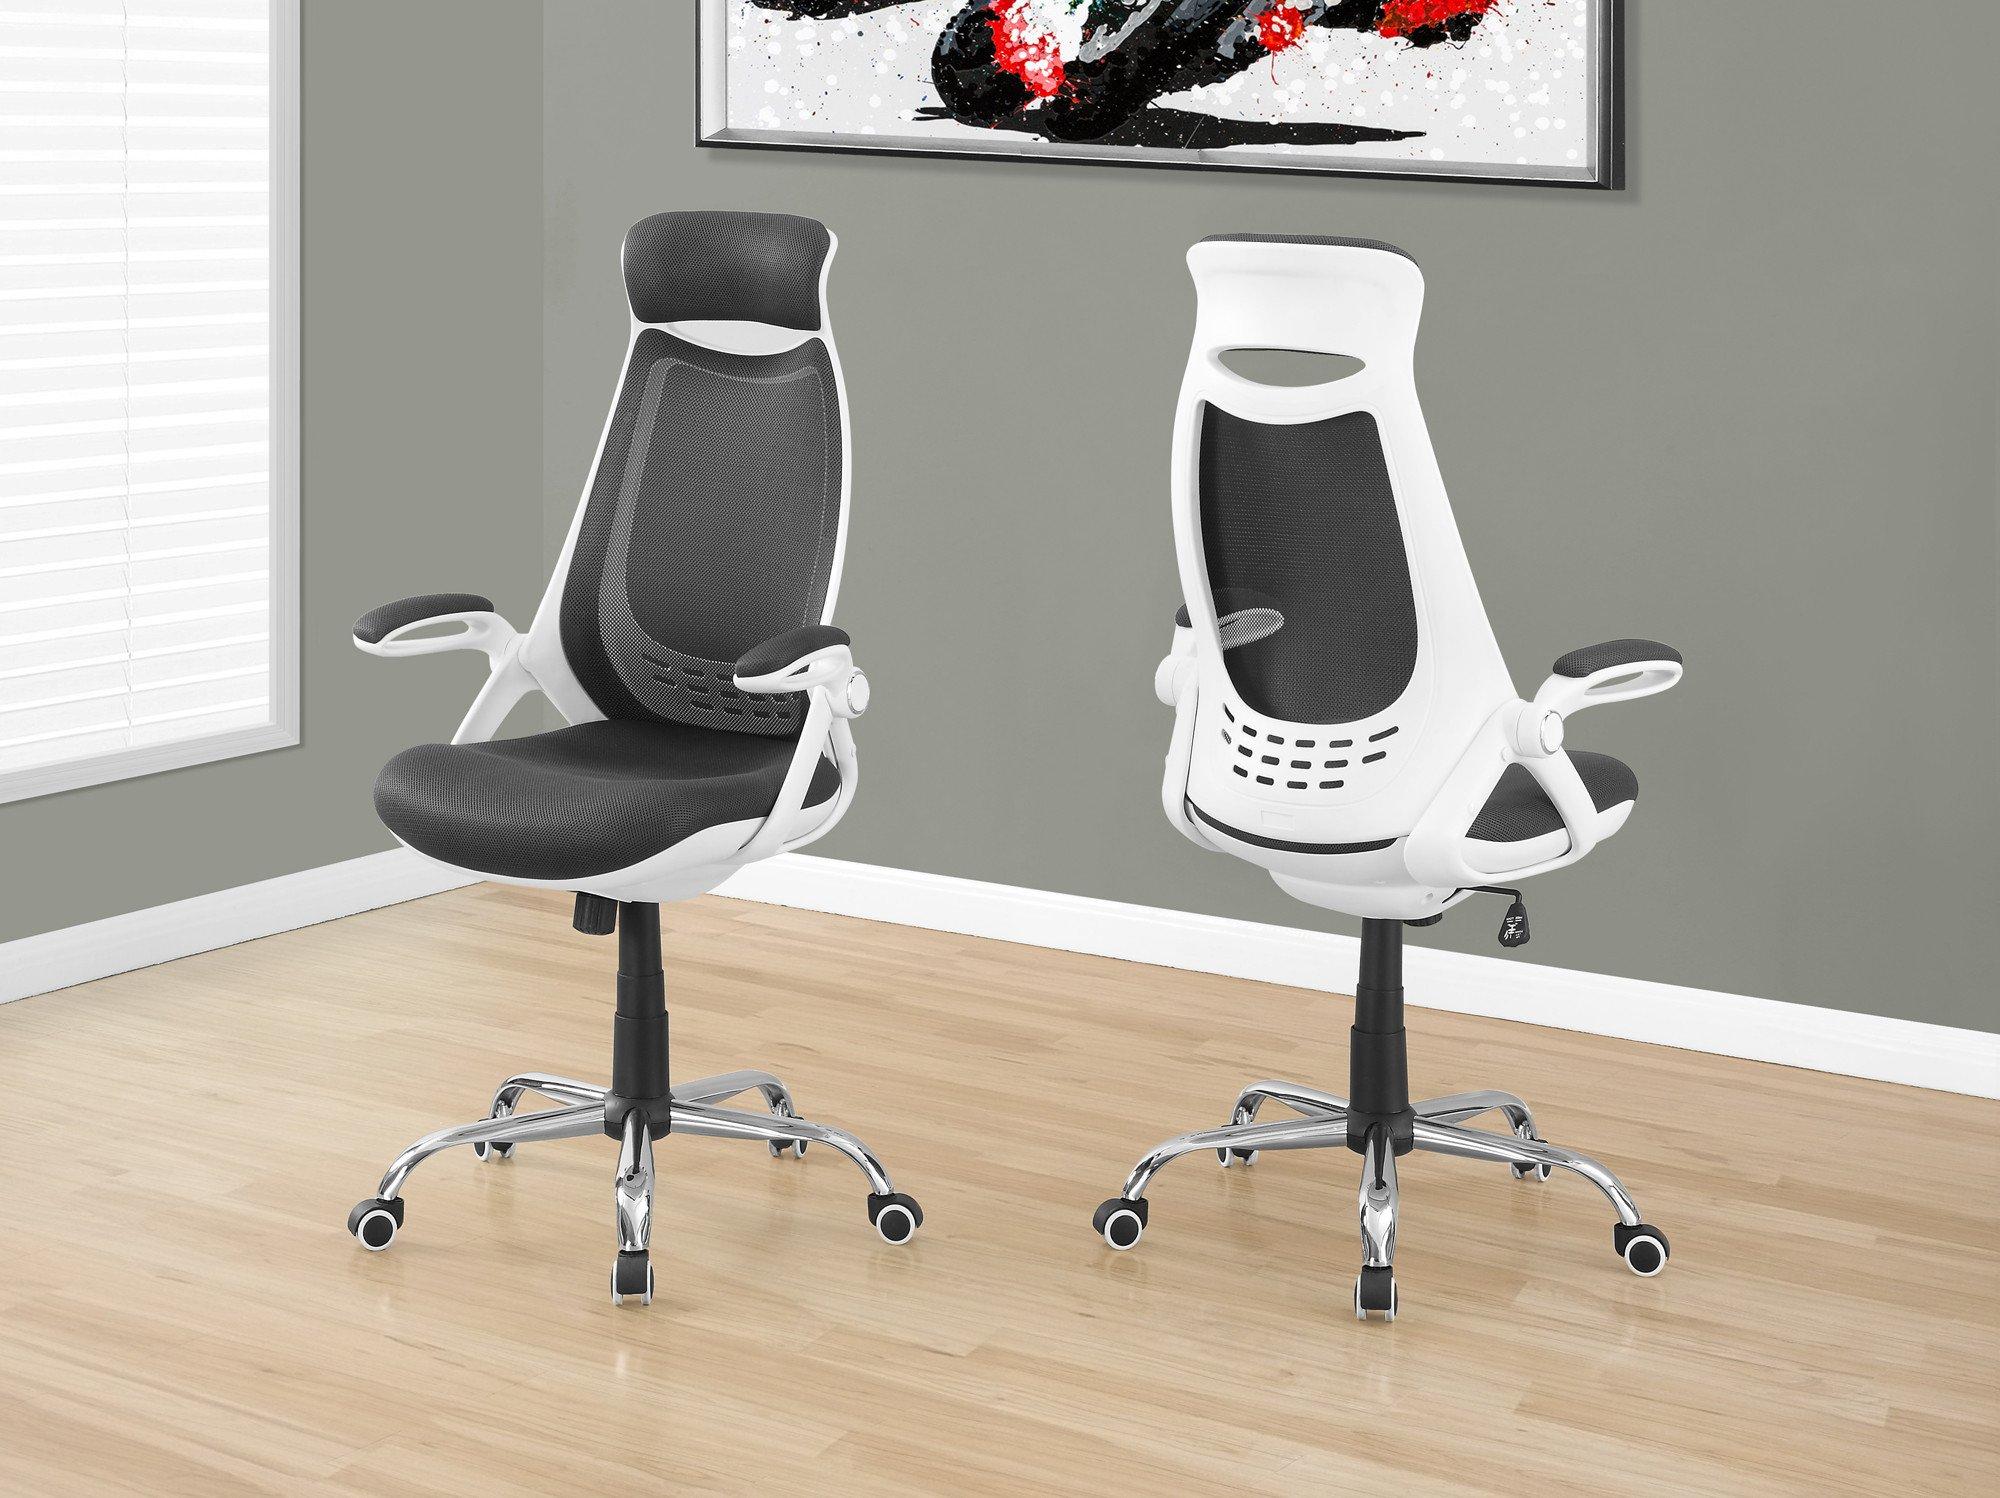 Premium Ergonomic White Black Mesh Office Chair With Headrest